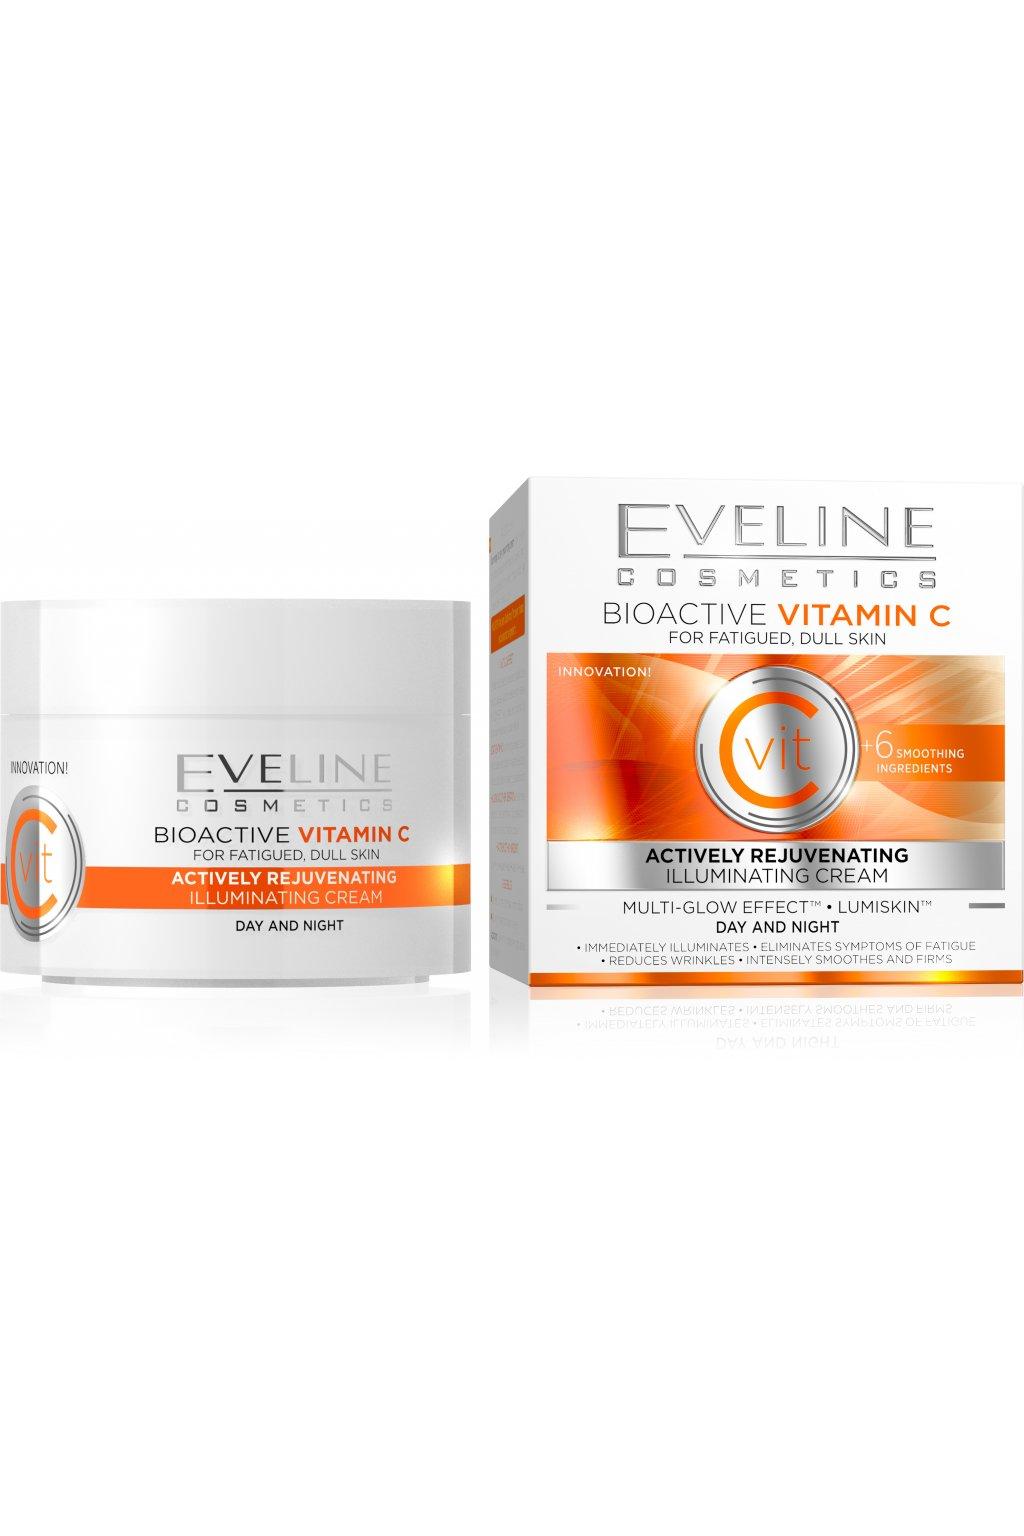 eveline cosmetics bioactive vitamin c rozjasnujici krem na den a noc 50ml.jpg